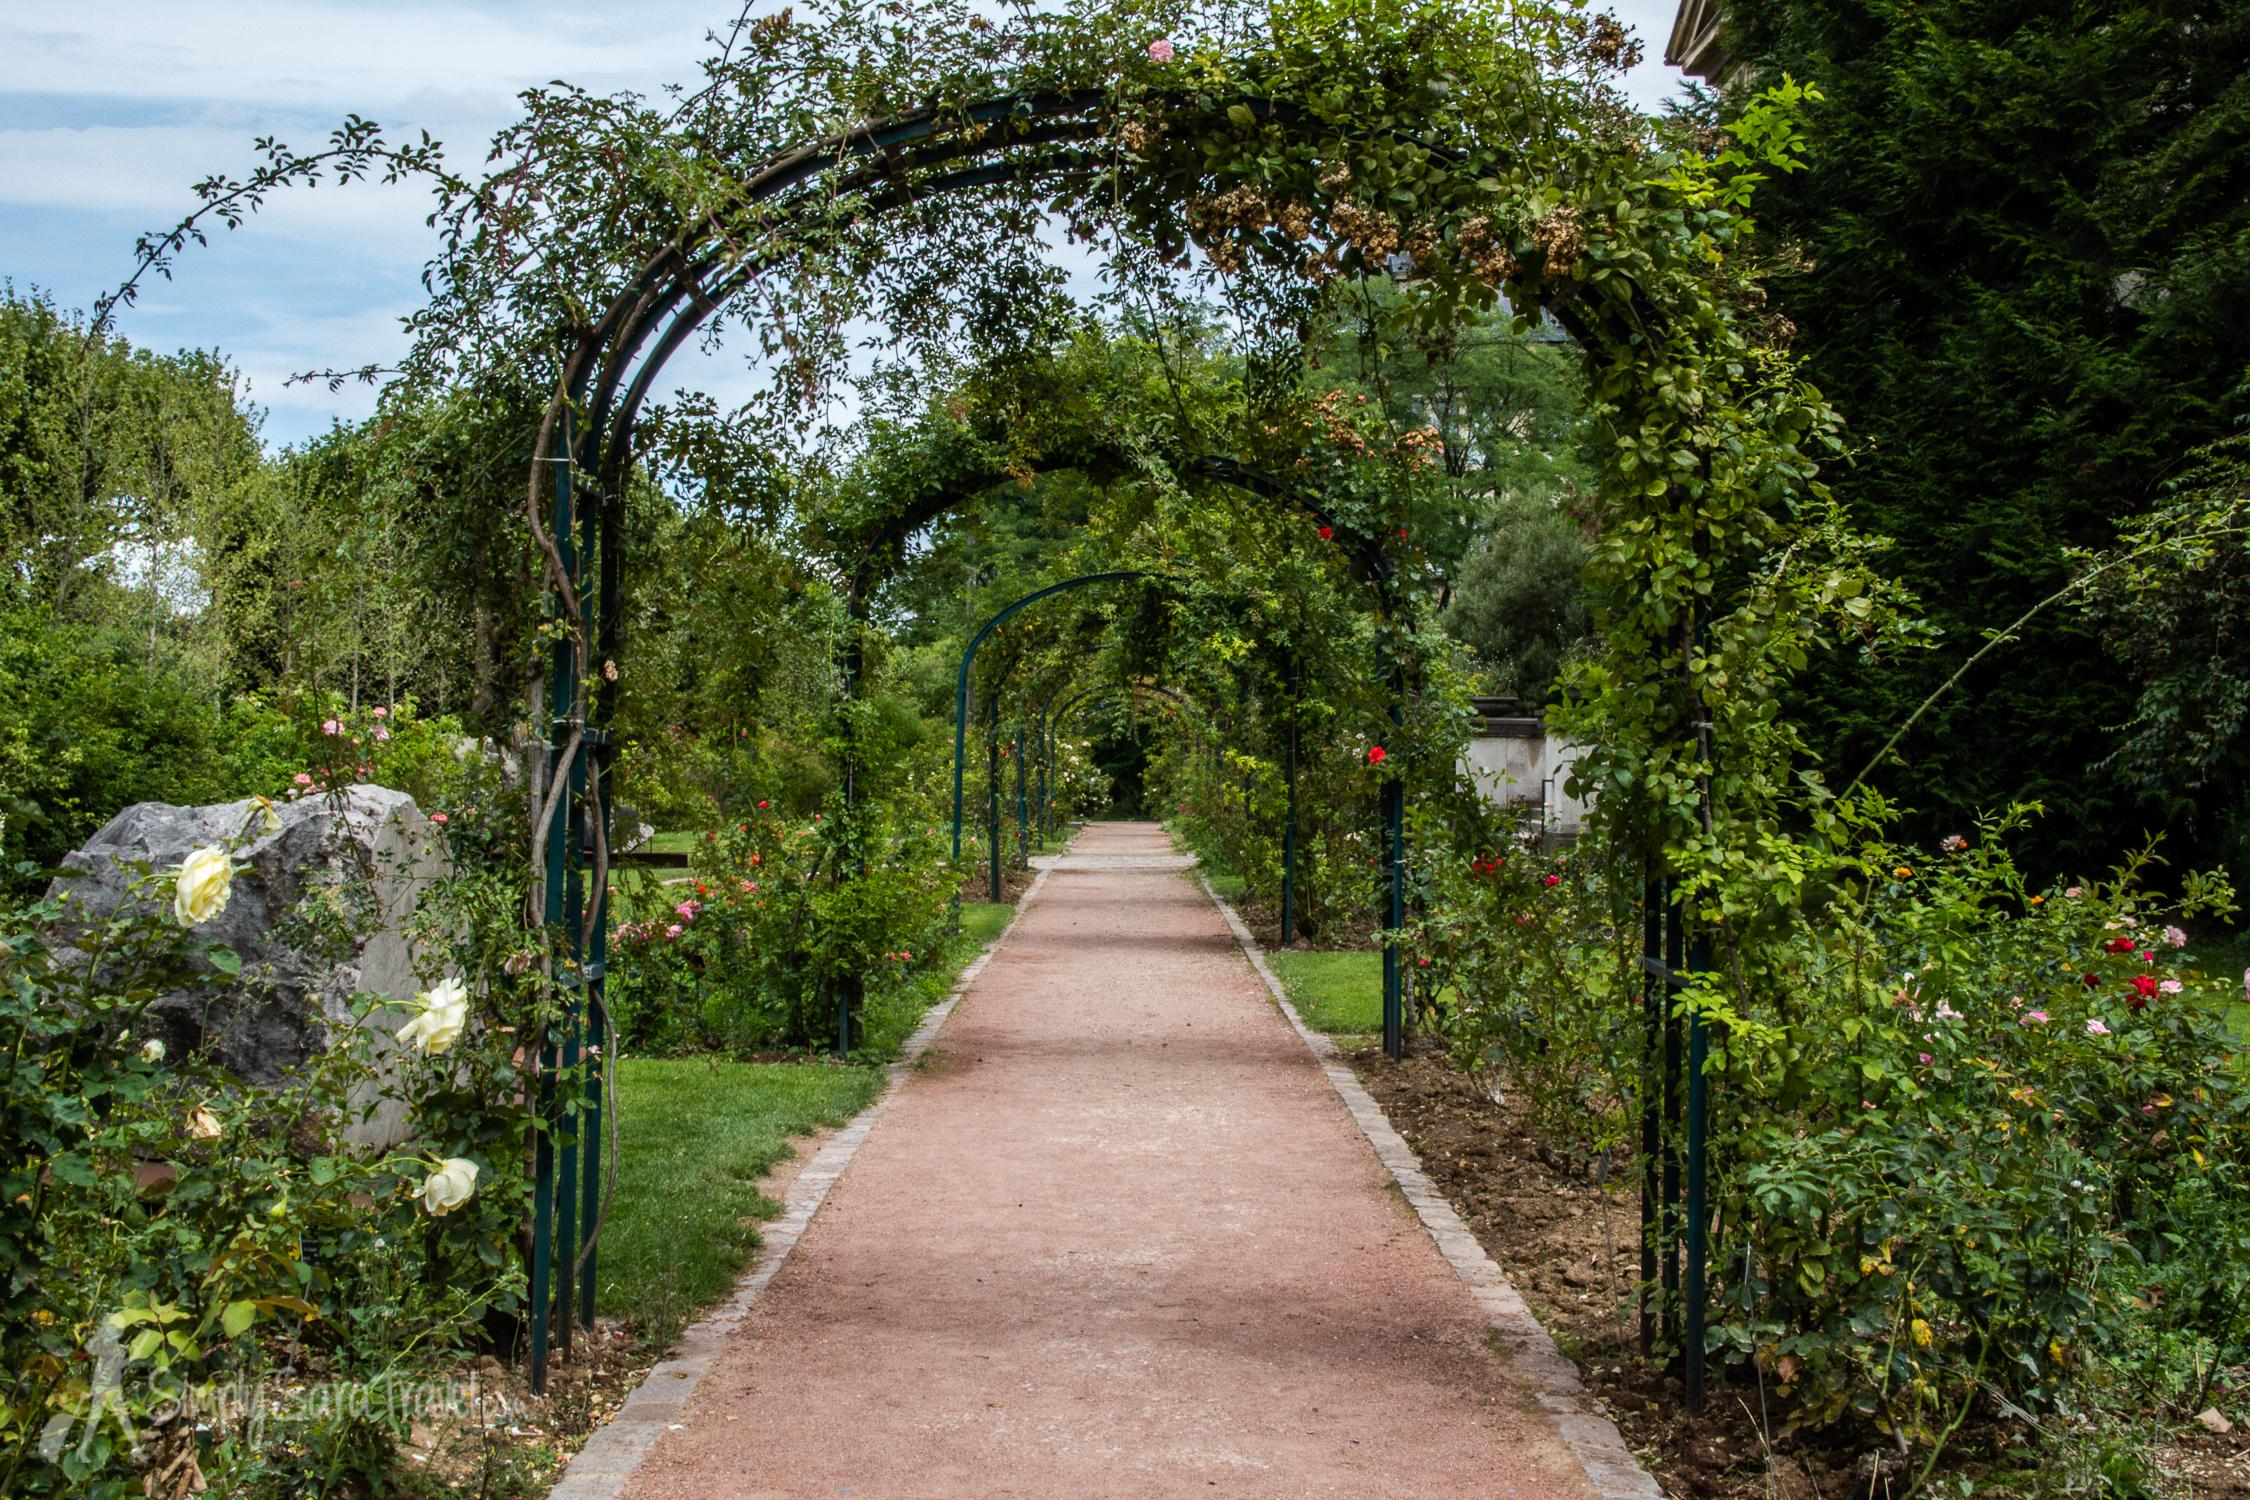 Path of Roses in the Jardin des Plantes, Paris